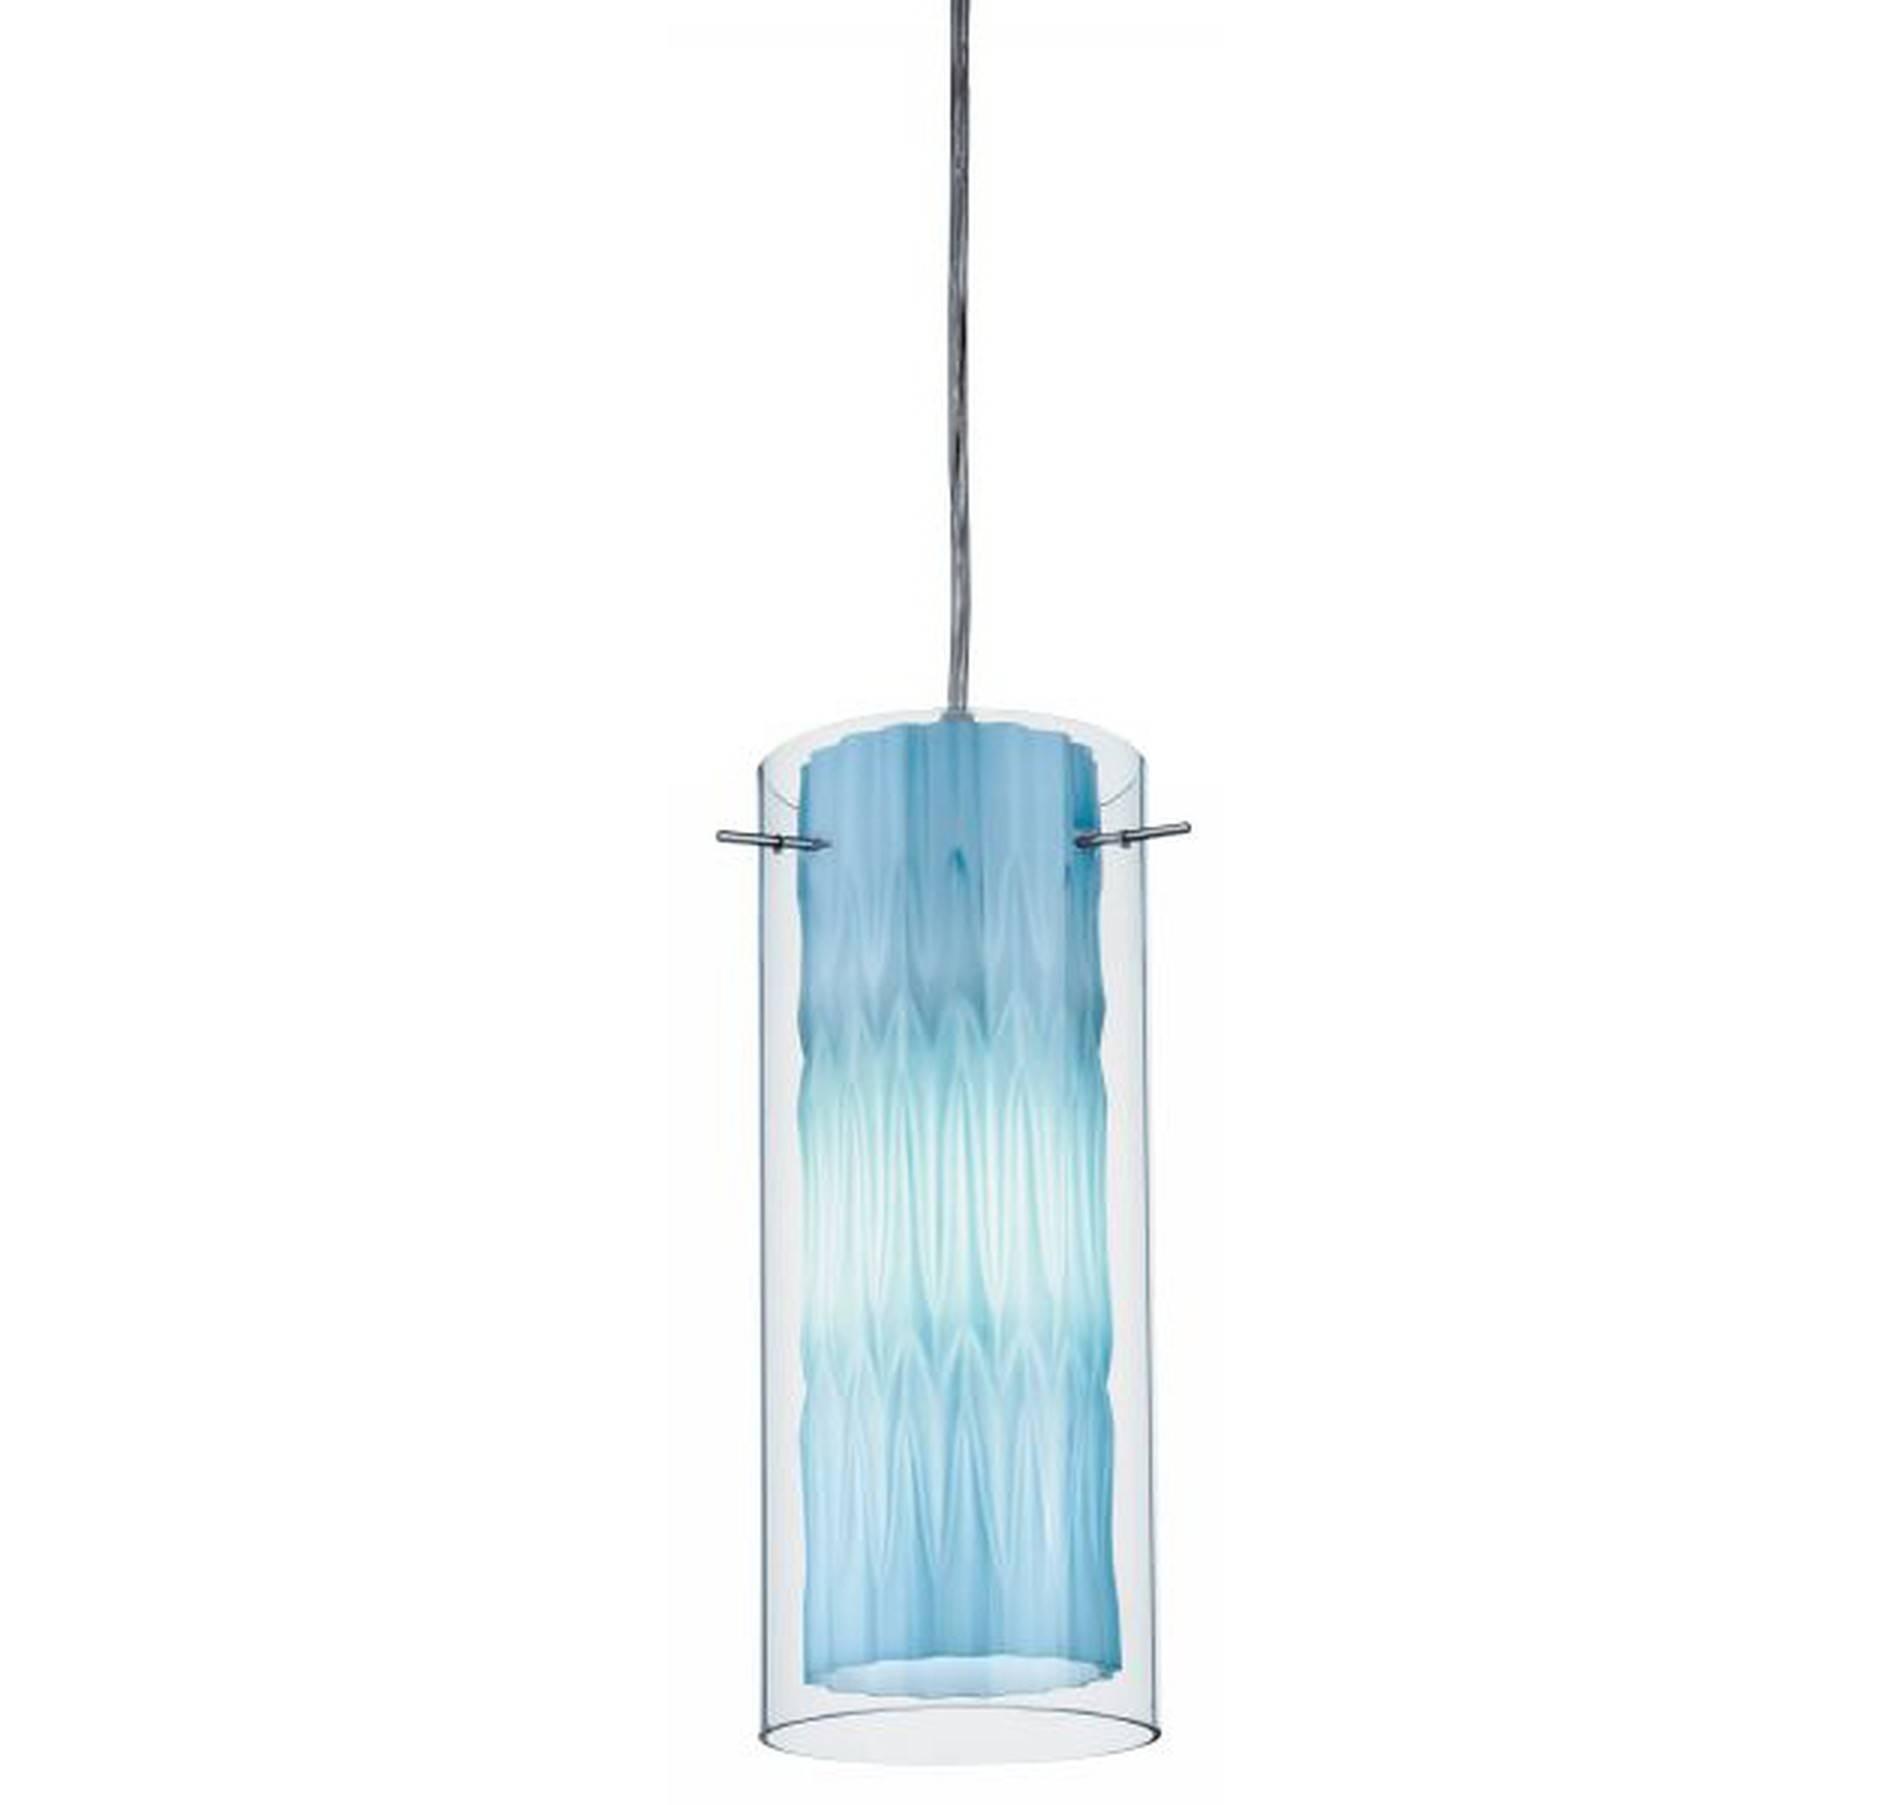 Stunning Blue Pendant Light Fixtures 28 For Led Kitchen Lights Within Blue Pendant Light Fixtures (View 12 of 15)